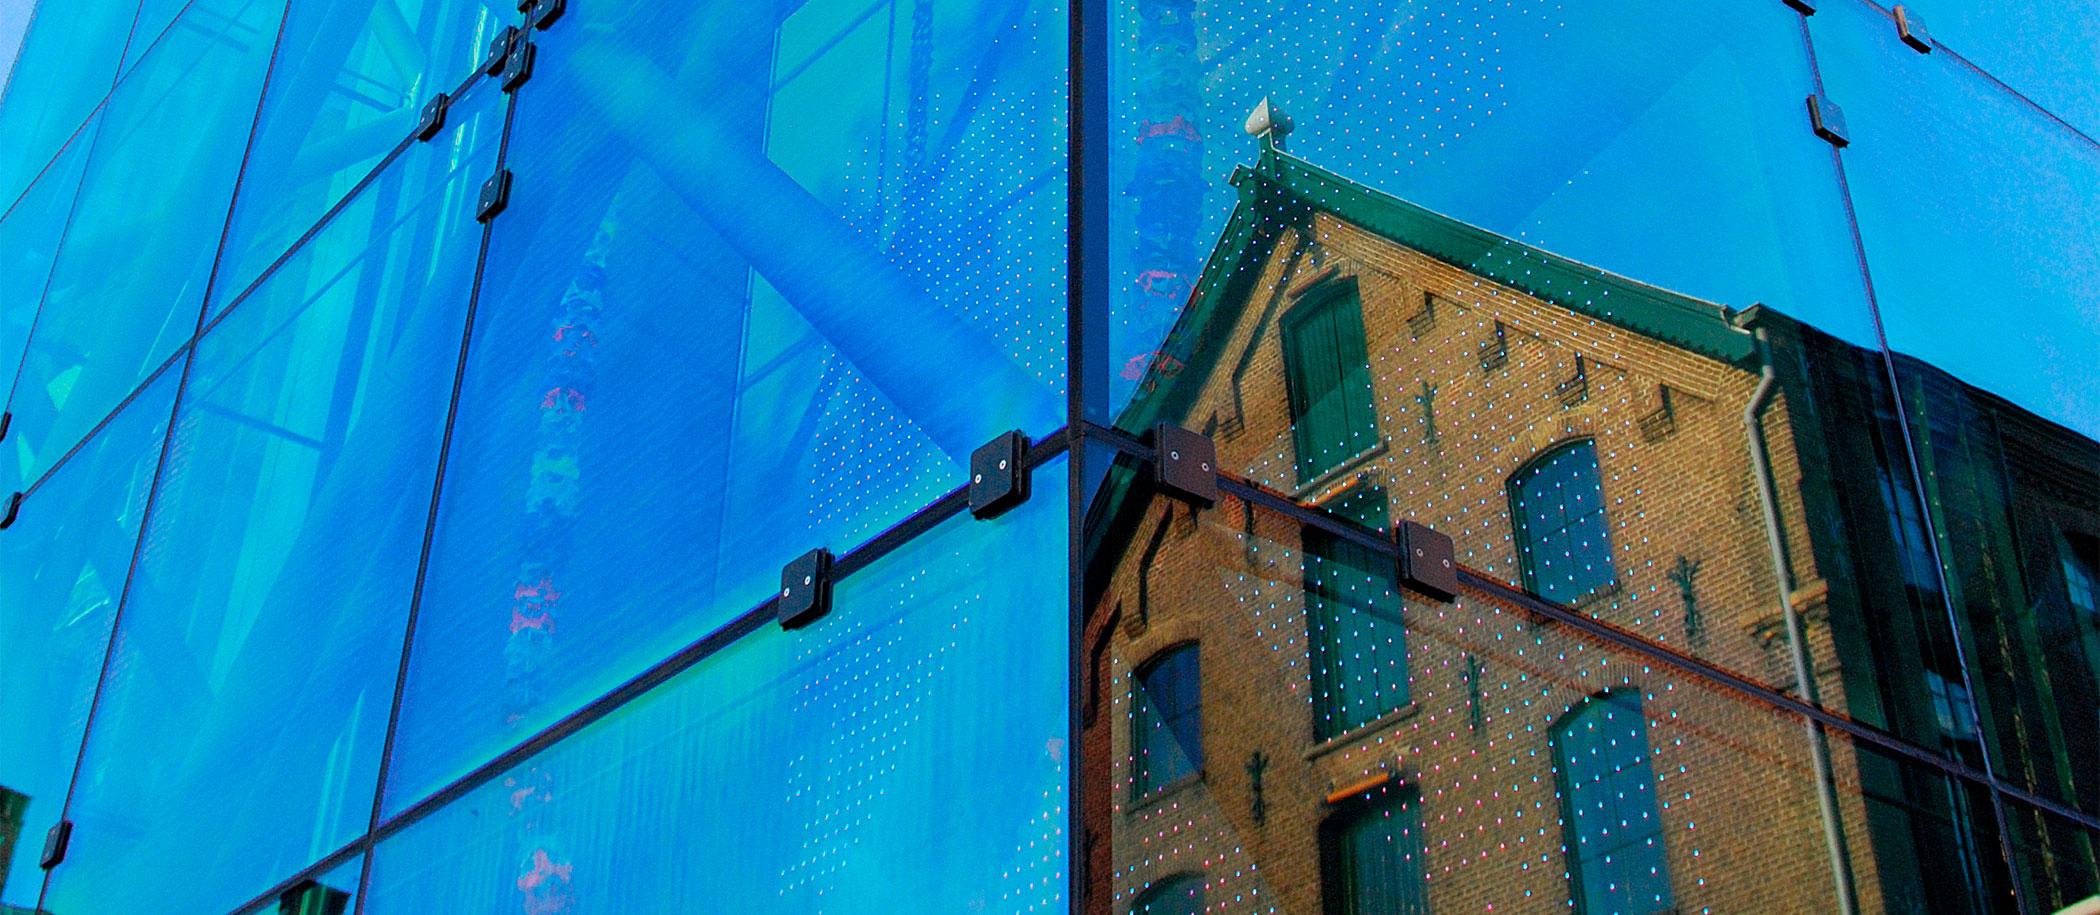 weerspiegeling villa in glazen entree gebouw